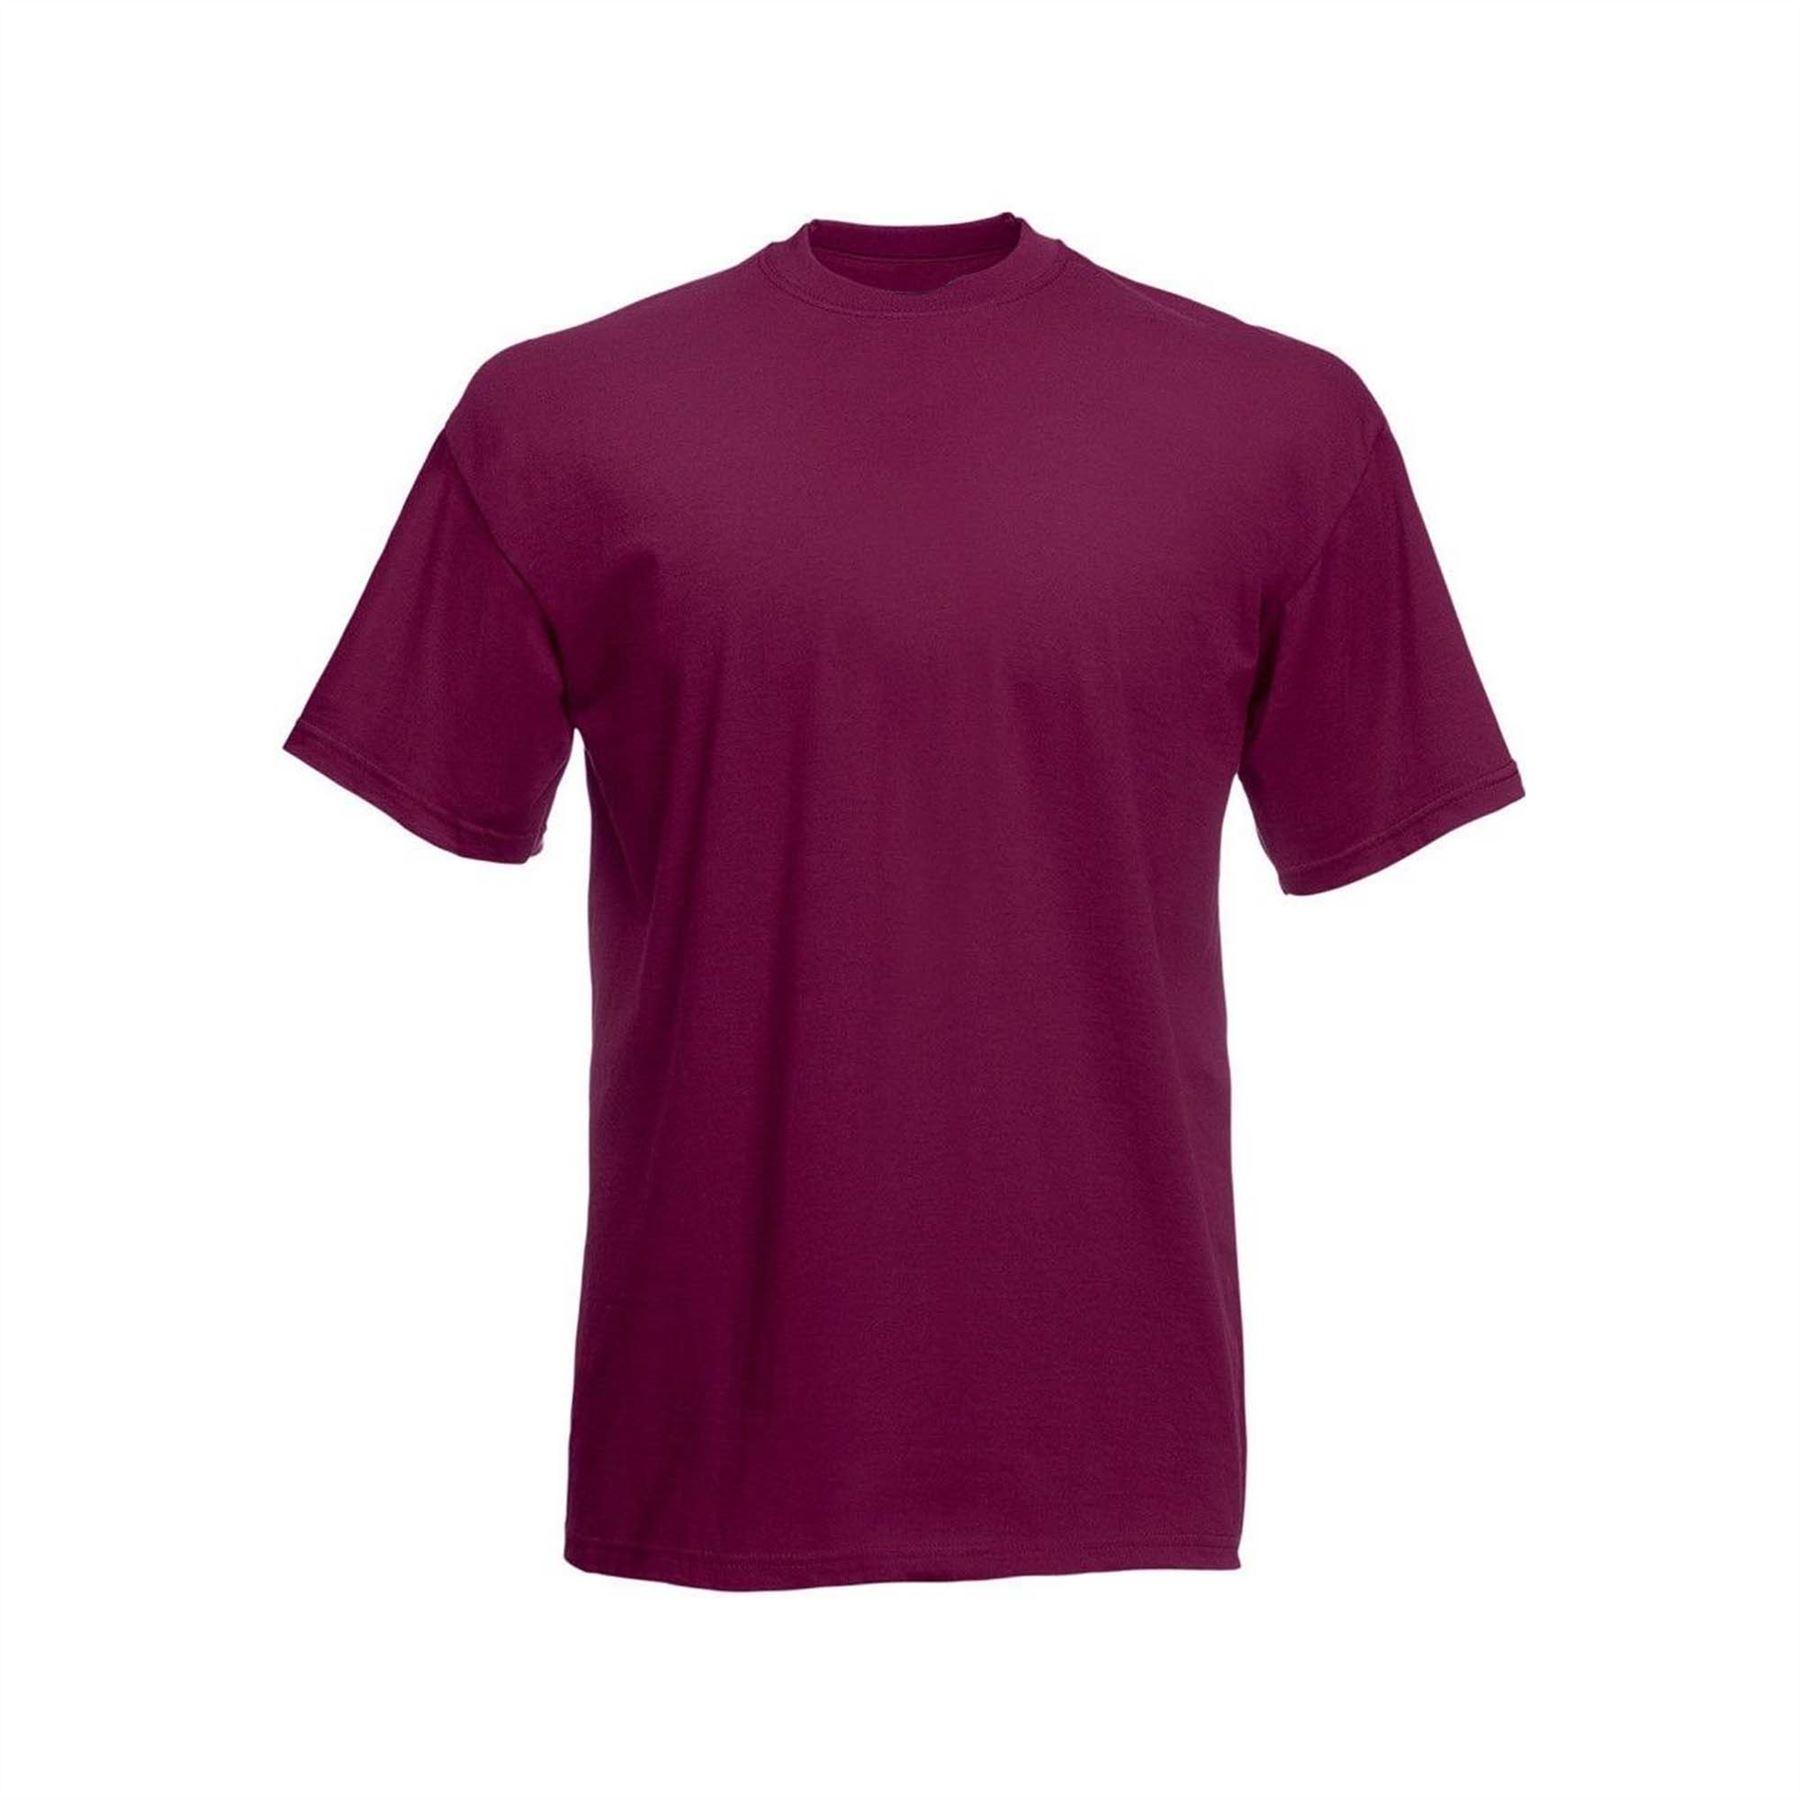 Men's Polo Shirt Plain T Shirt Blank Short Sleeve Shirt Mens ...